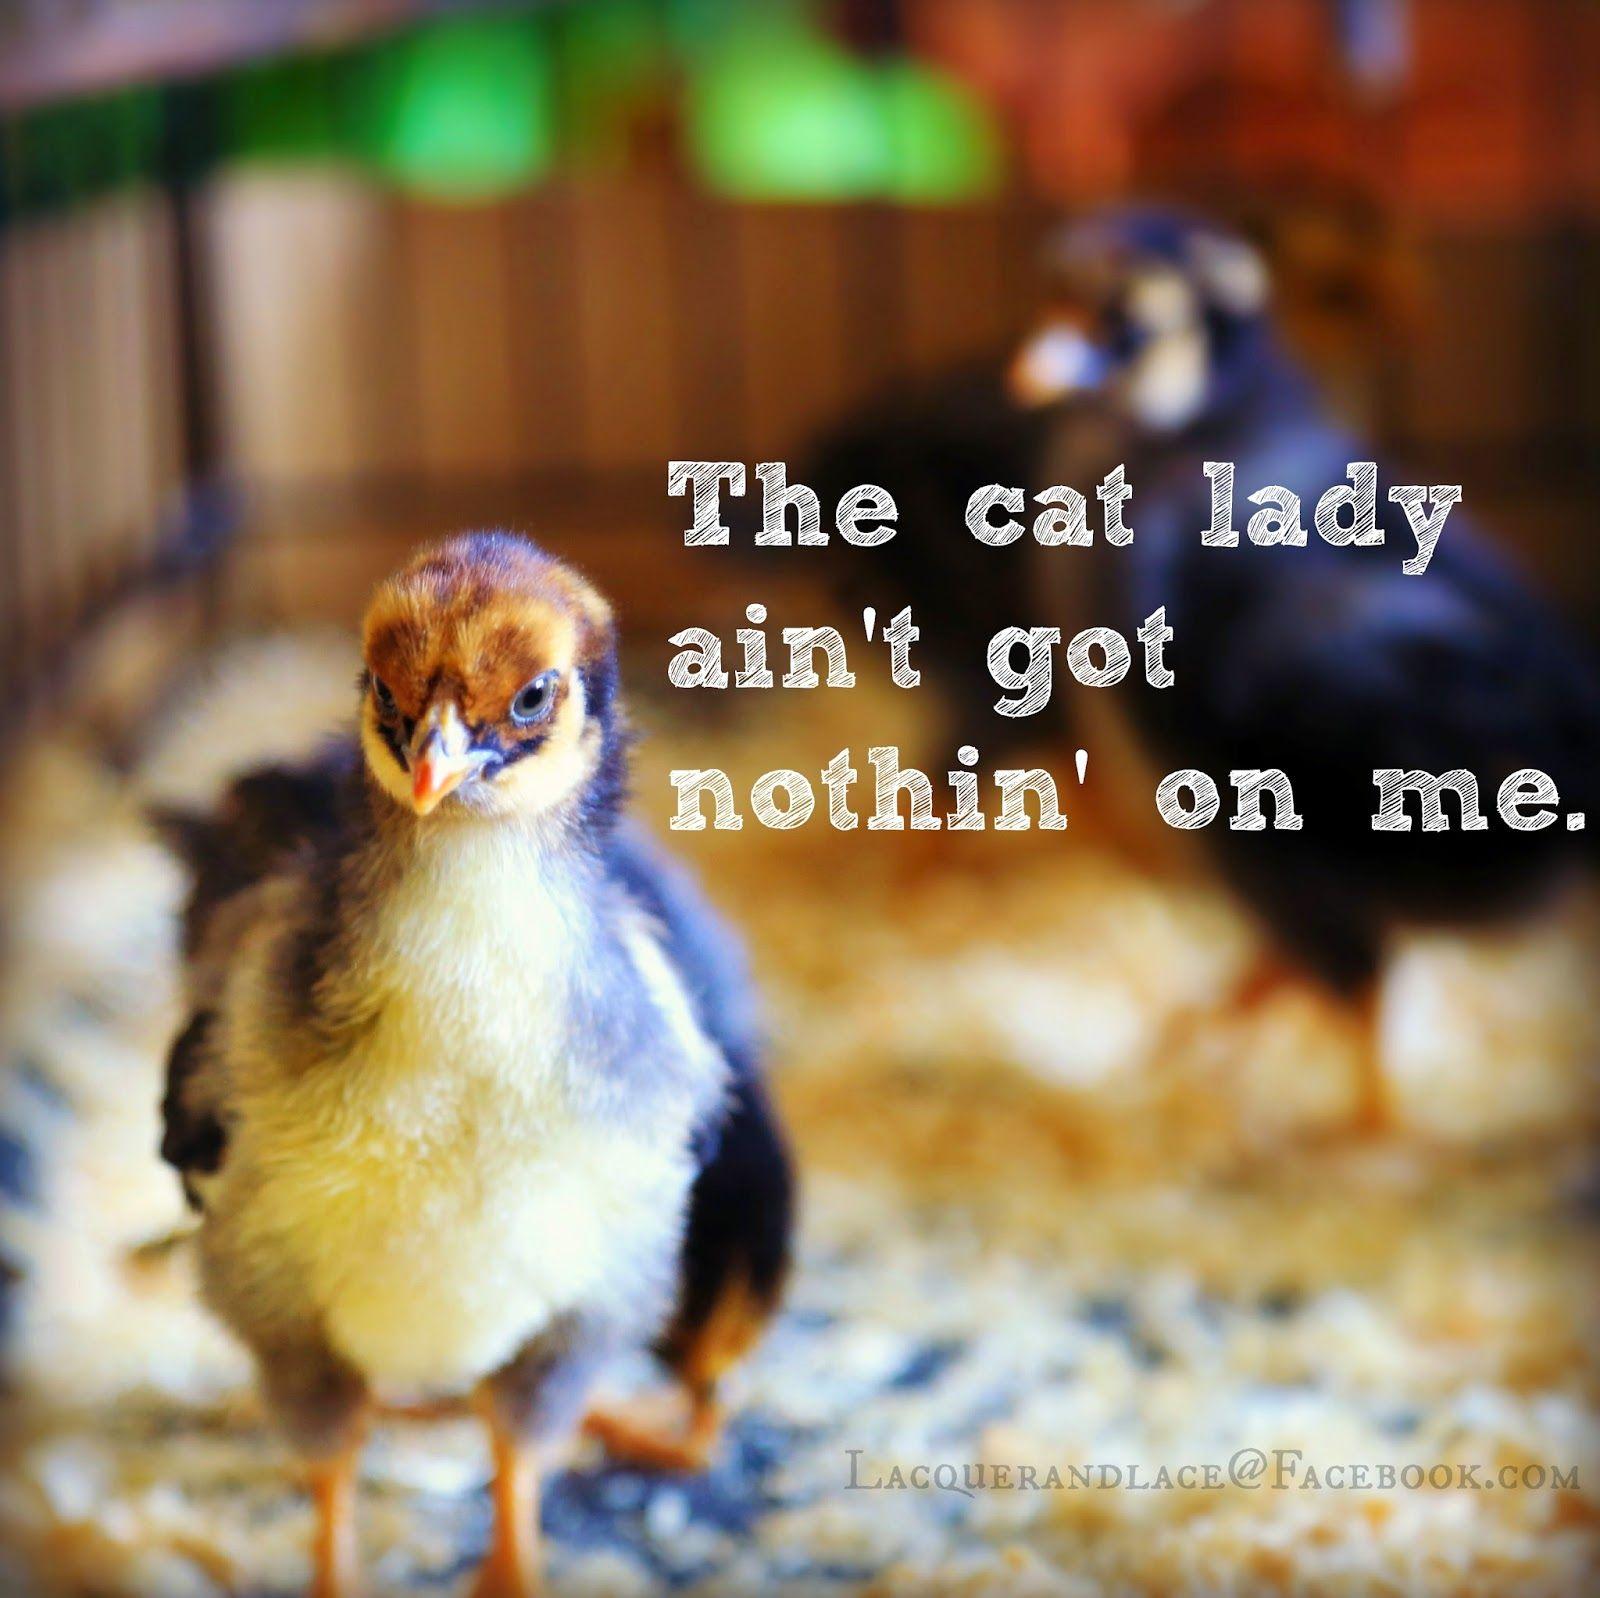 Lacquerandlace Chickens backyard, Crazy chicken lady